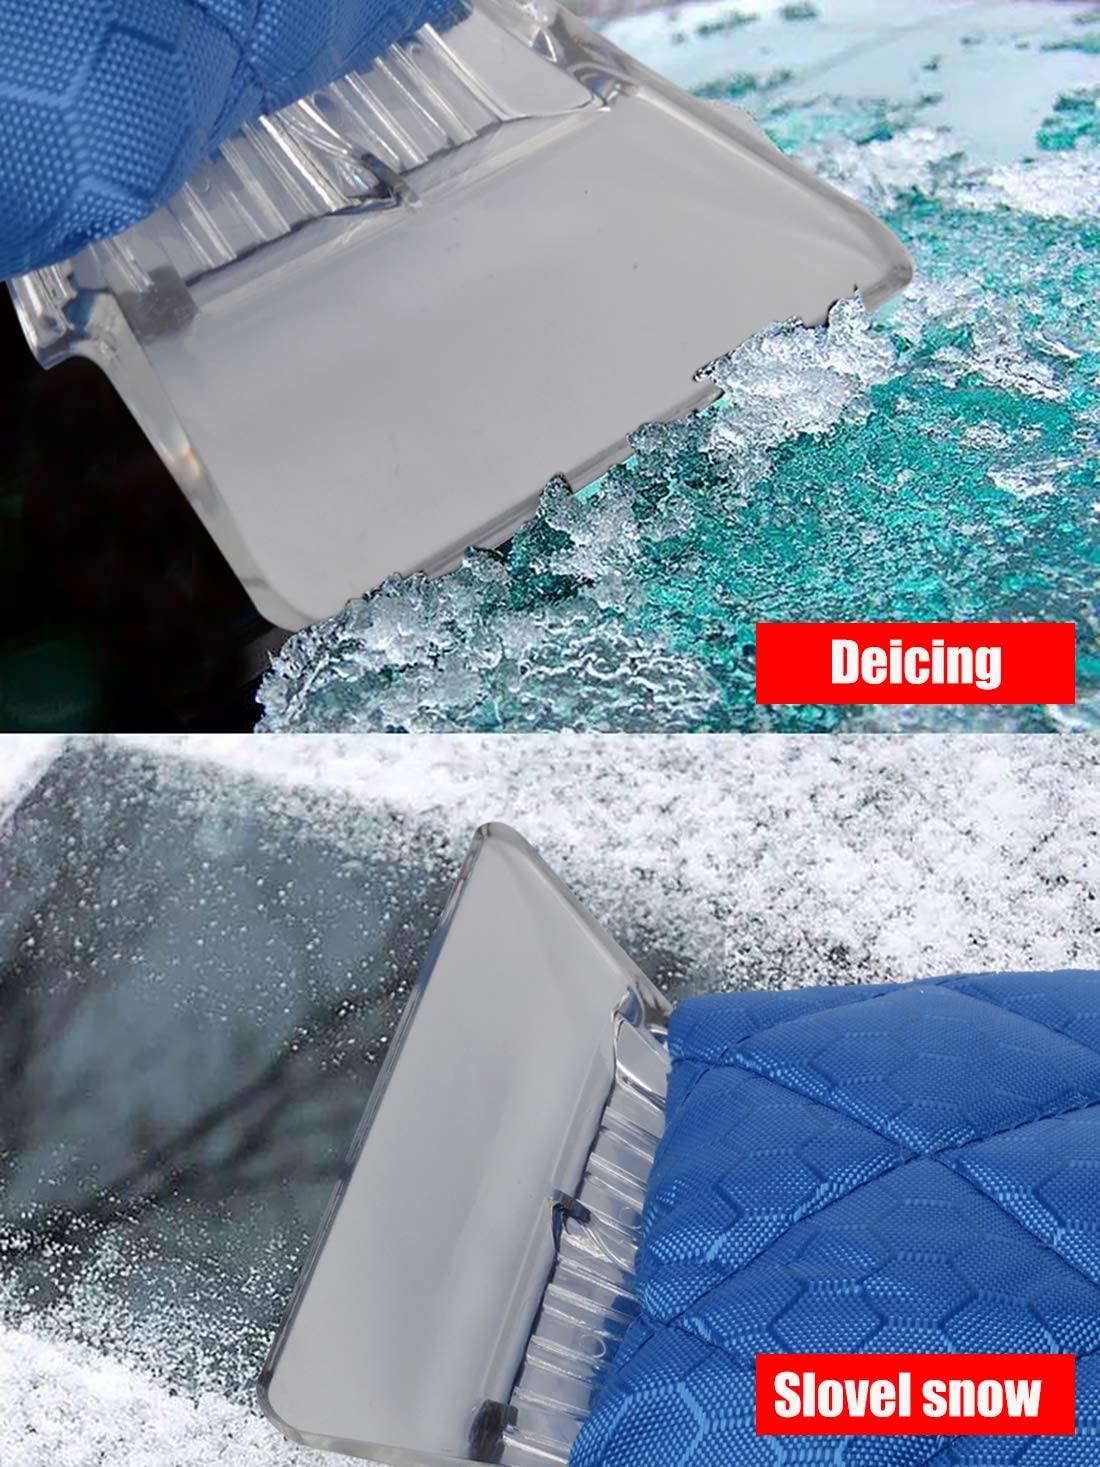 Waterproof Warm Non-slip Blade Winter Snow Removal Ice Tool Non Scratch Car Window Cleaning Scraper